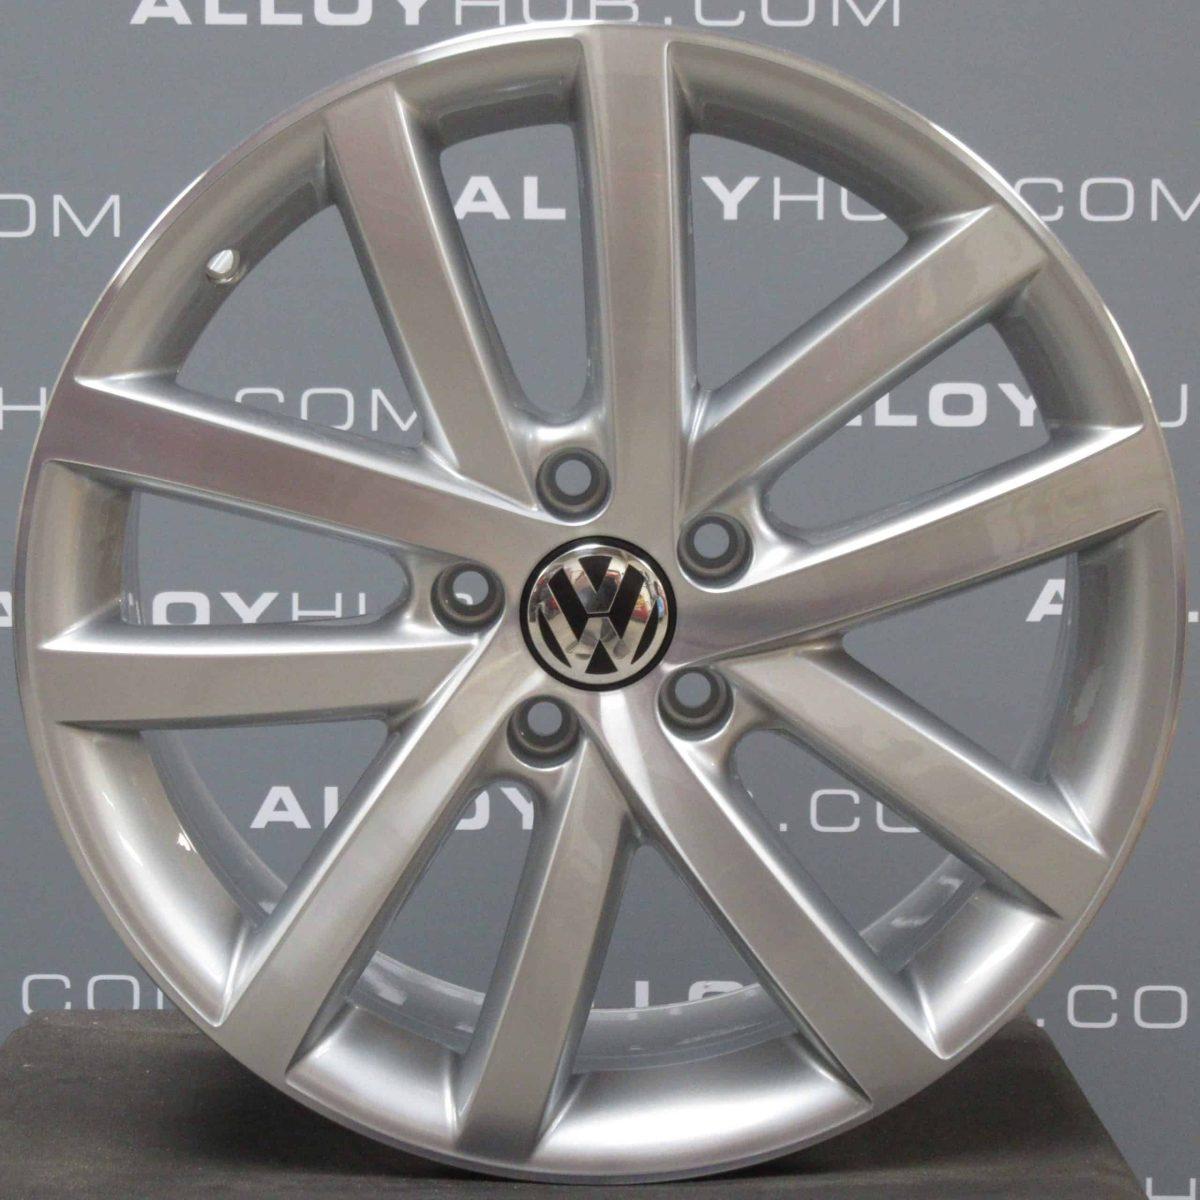 Genuine Volkswagen Golf MK6 Vancouver 5 Twin Spoke 18″ inch Alloy Wheels with Silver & Diamond Turned Finish 5K0 601 025 L